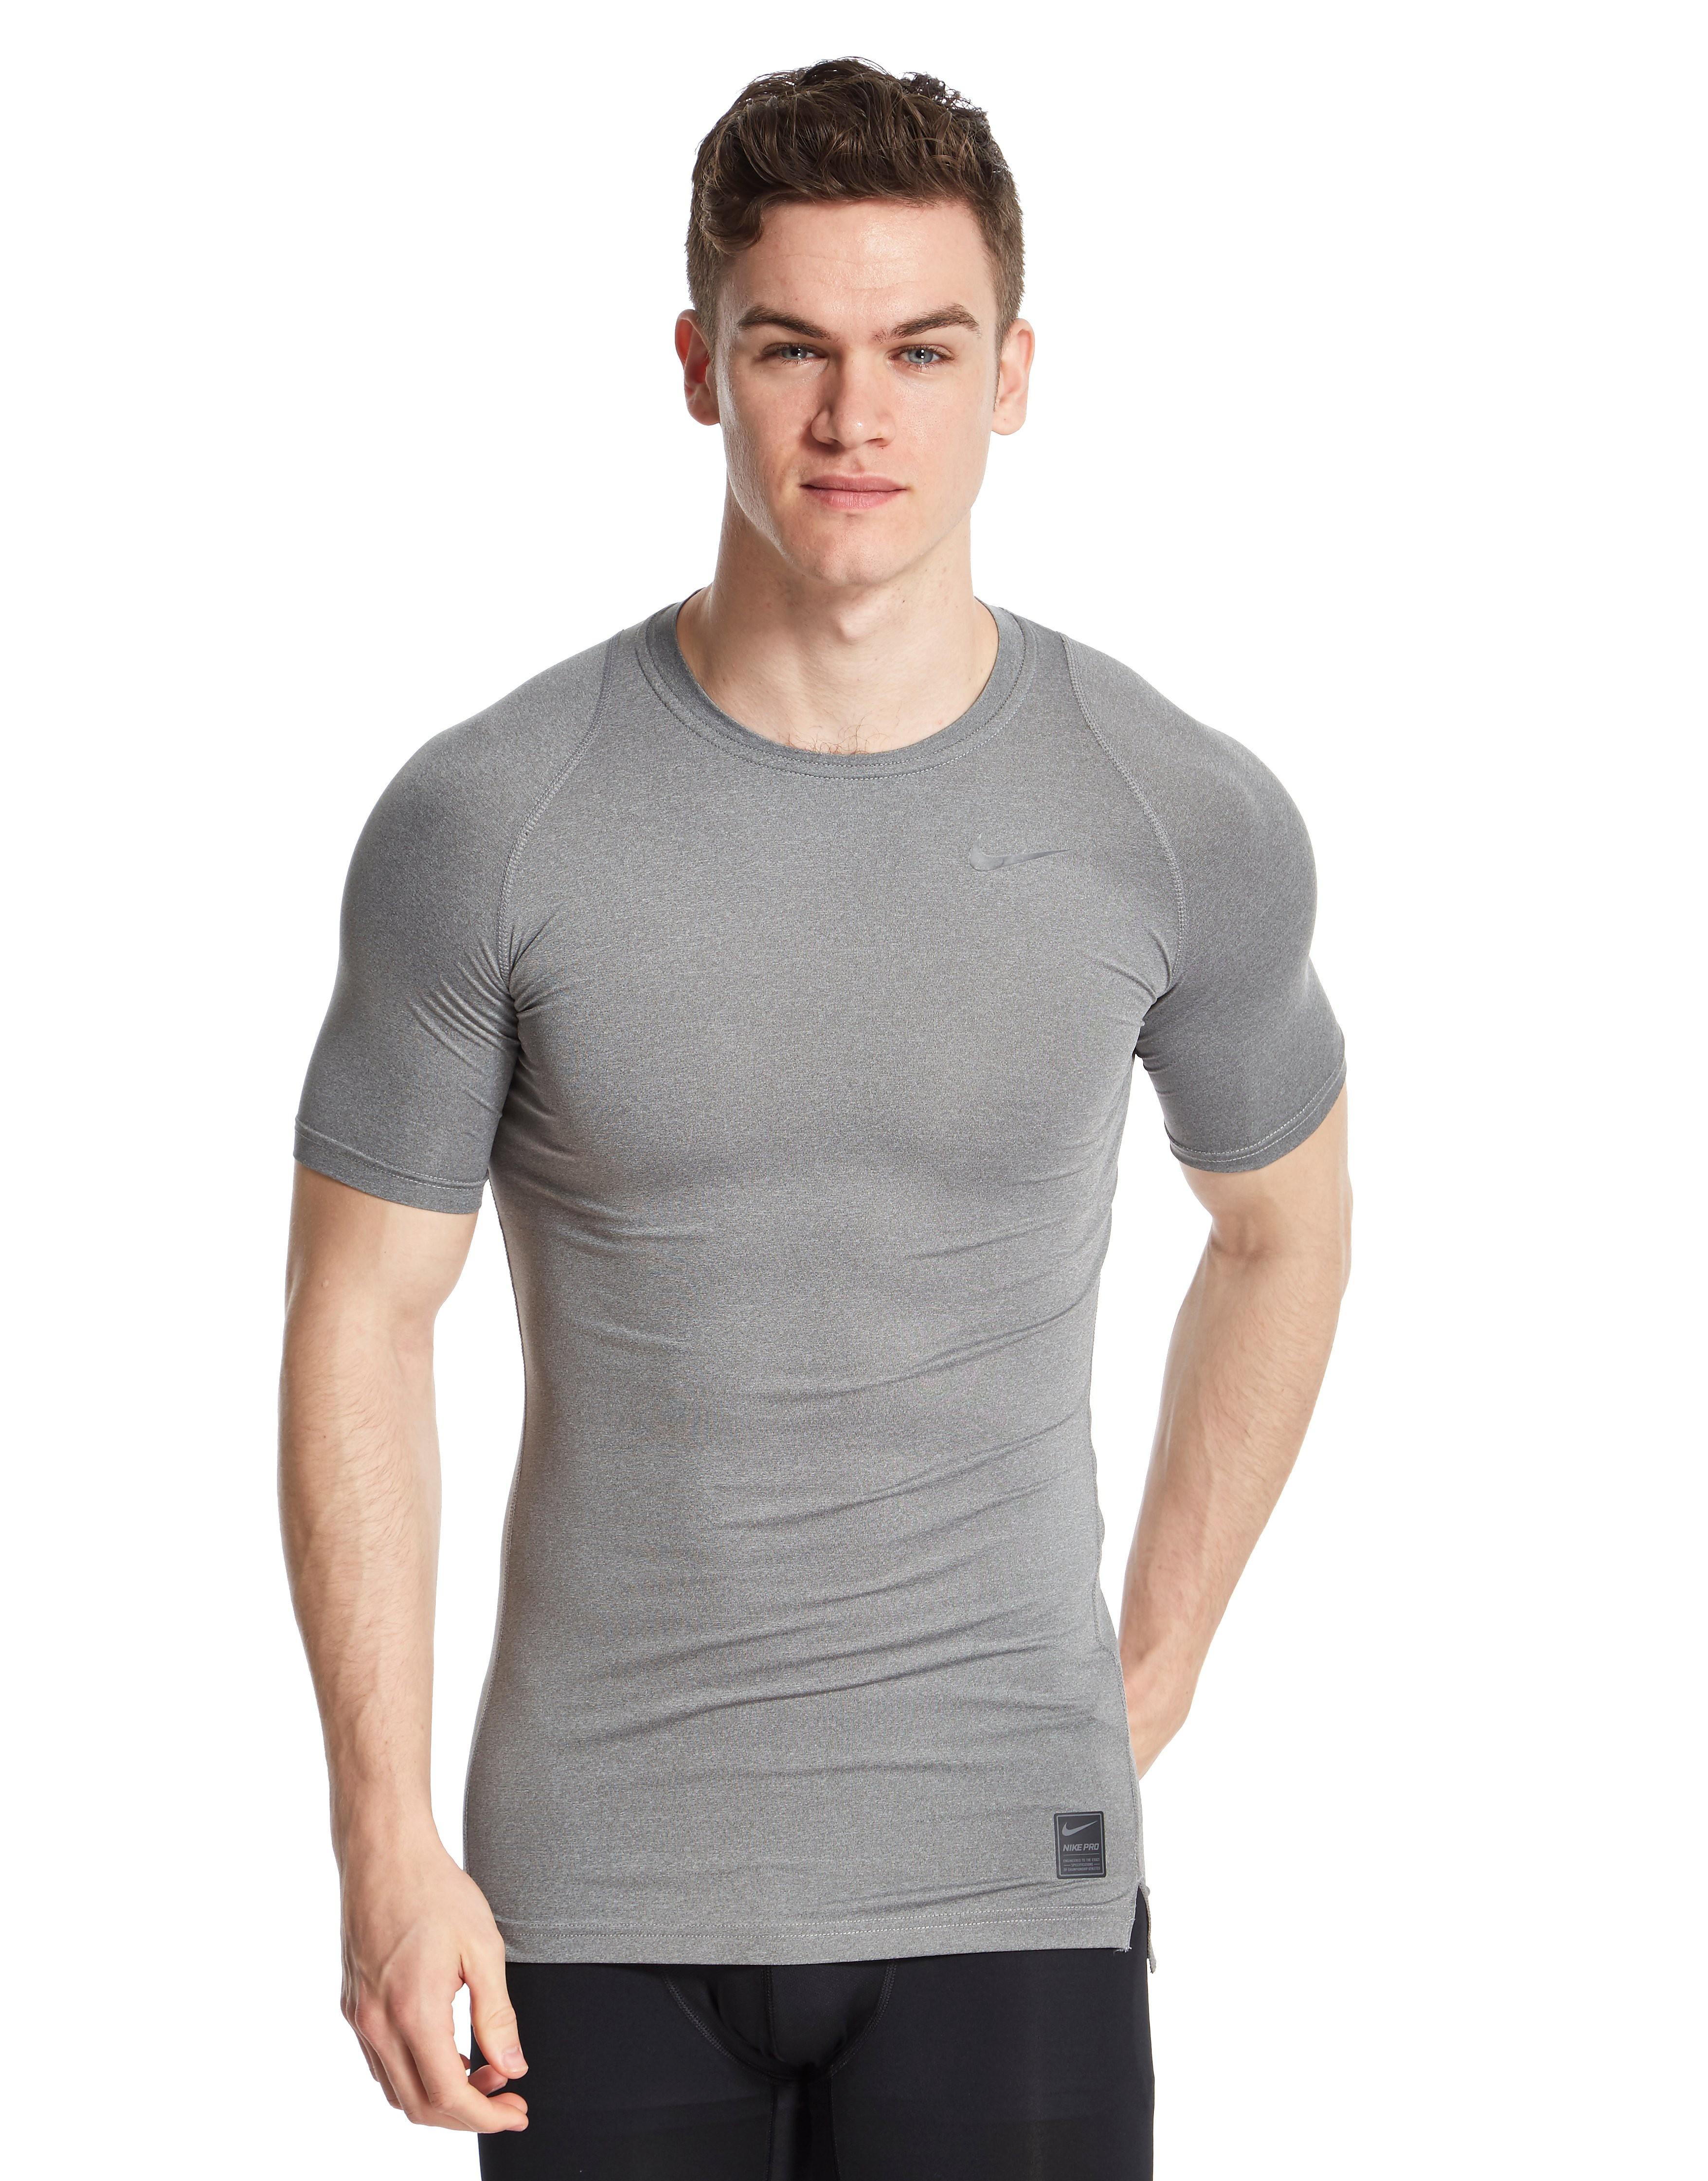 Nike Pro Cool Kompressionsshirt